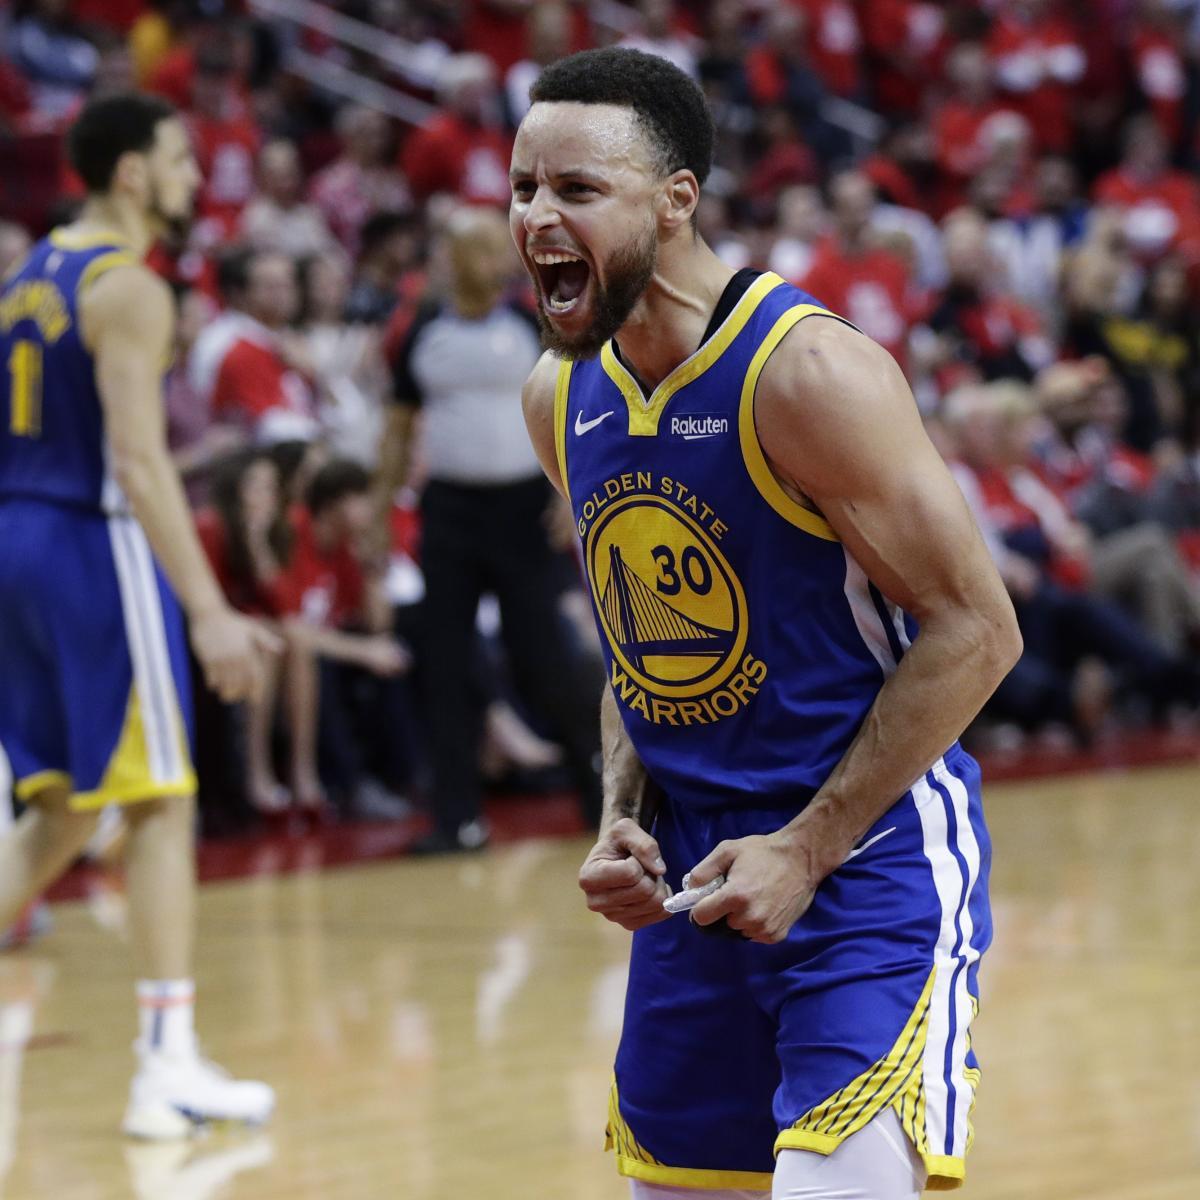 Raptors Vs. Warriors: 2019 NBA Finals Full Schedule, Times